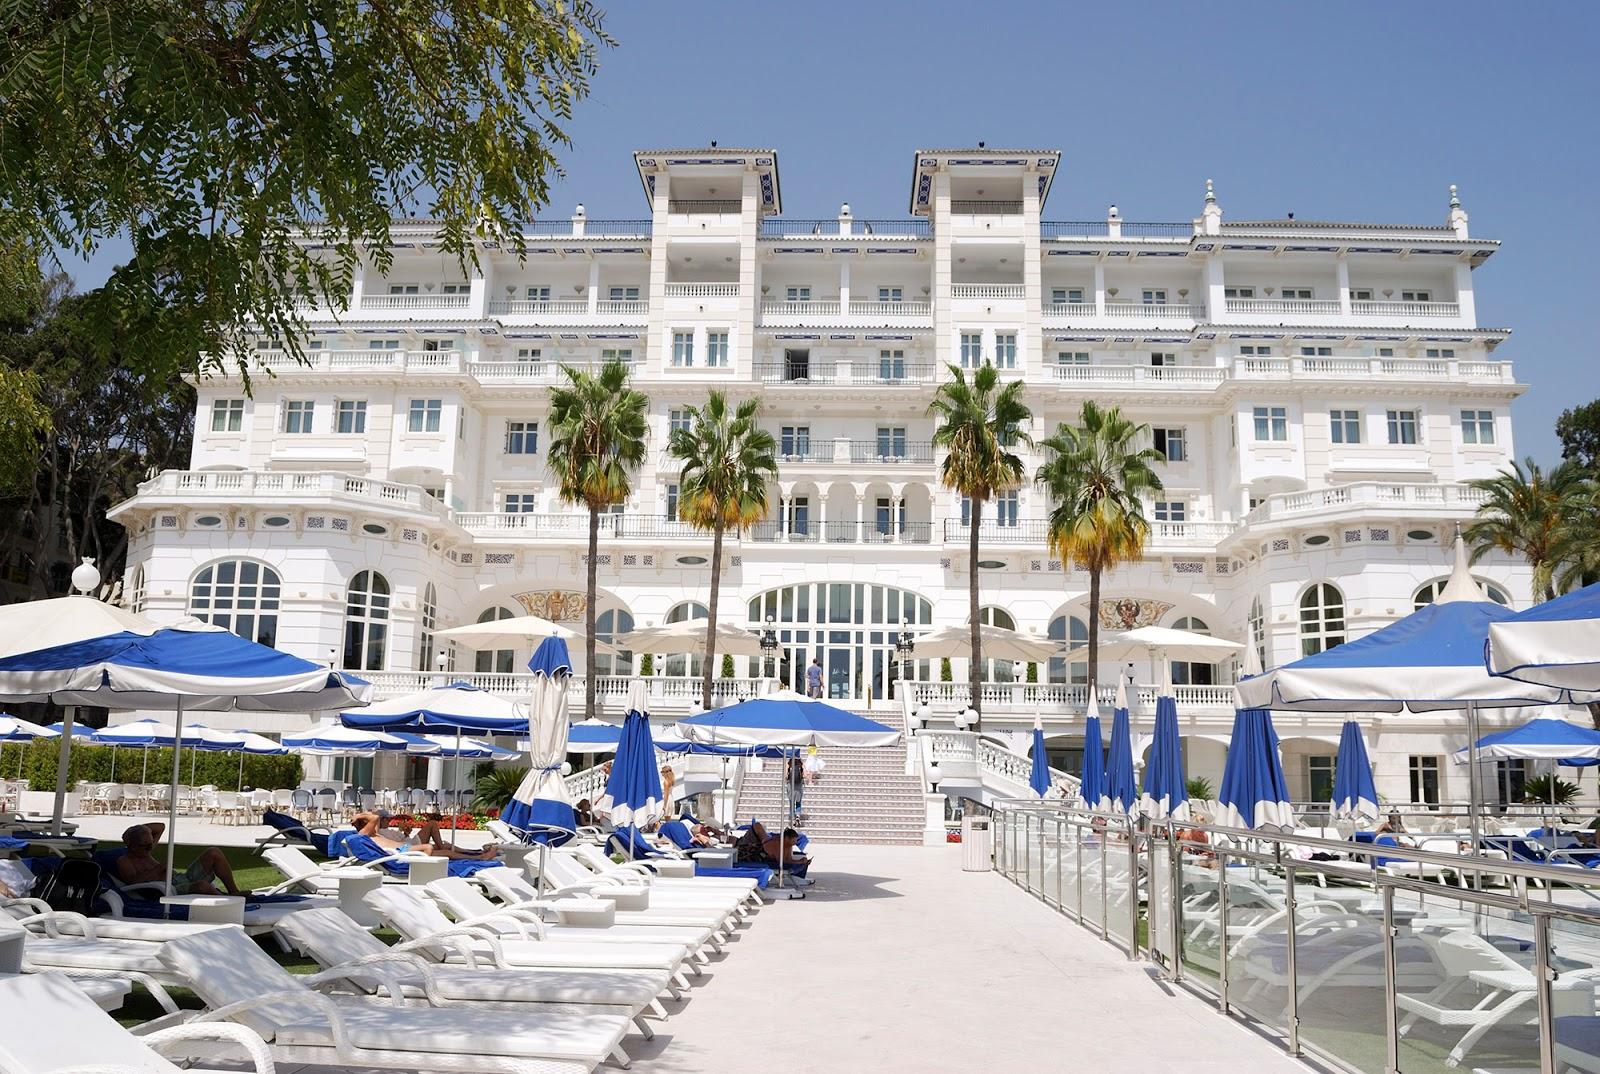 palacio miramar hotel malaga spain